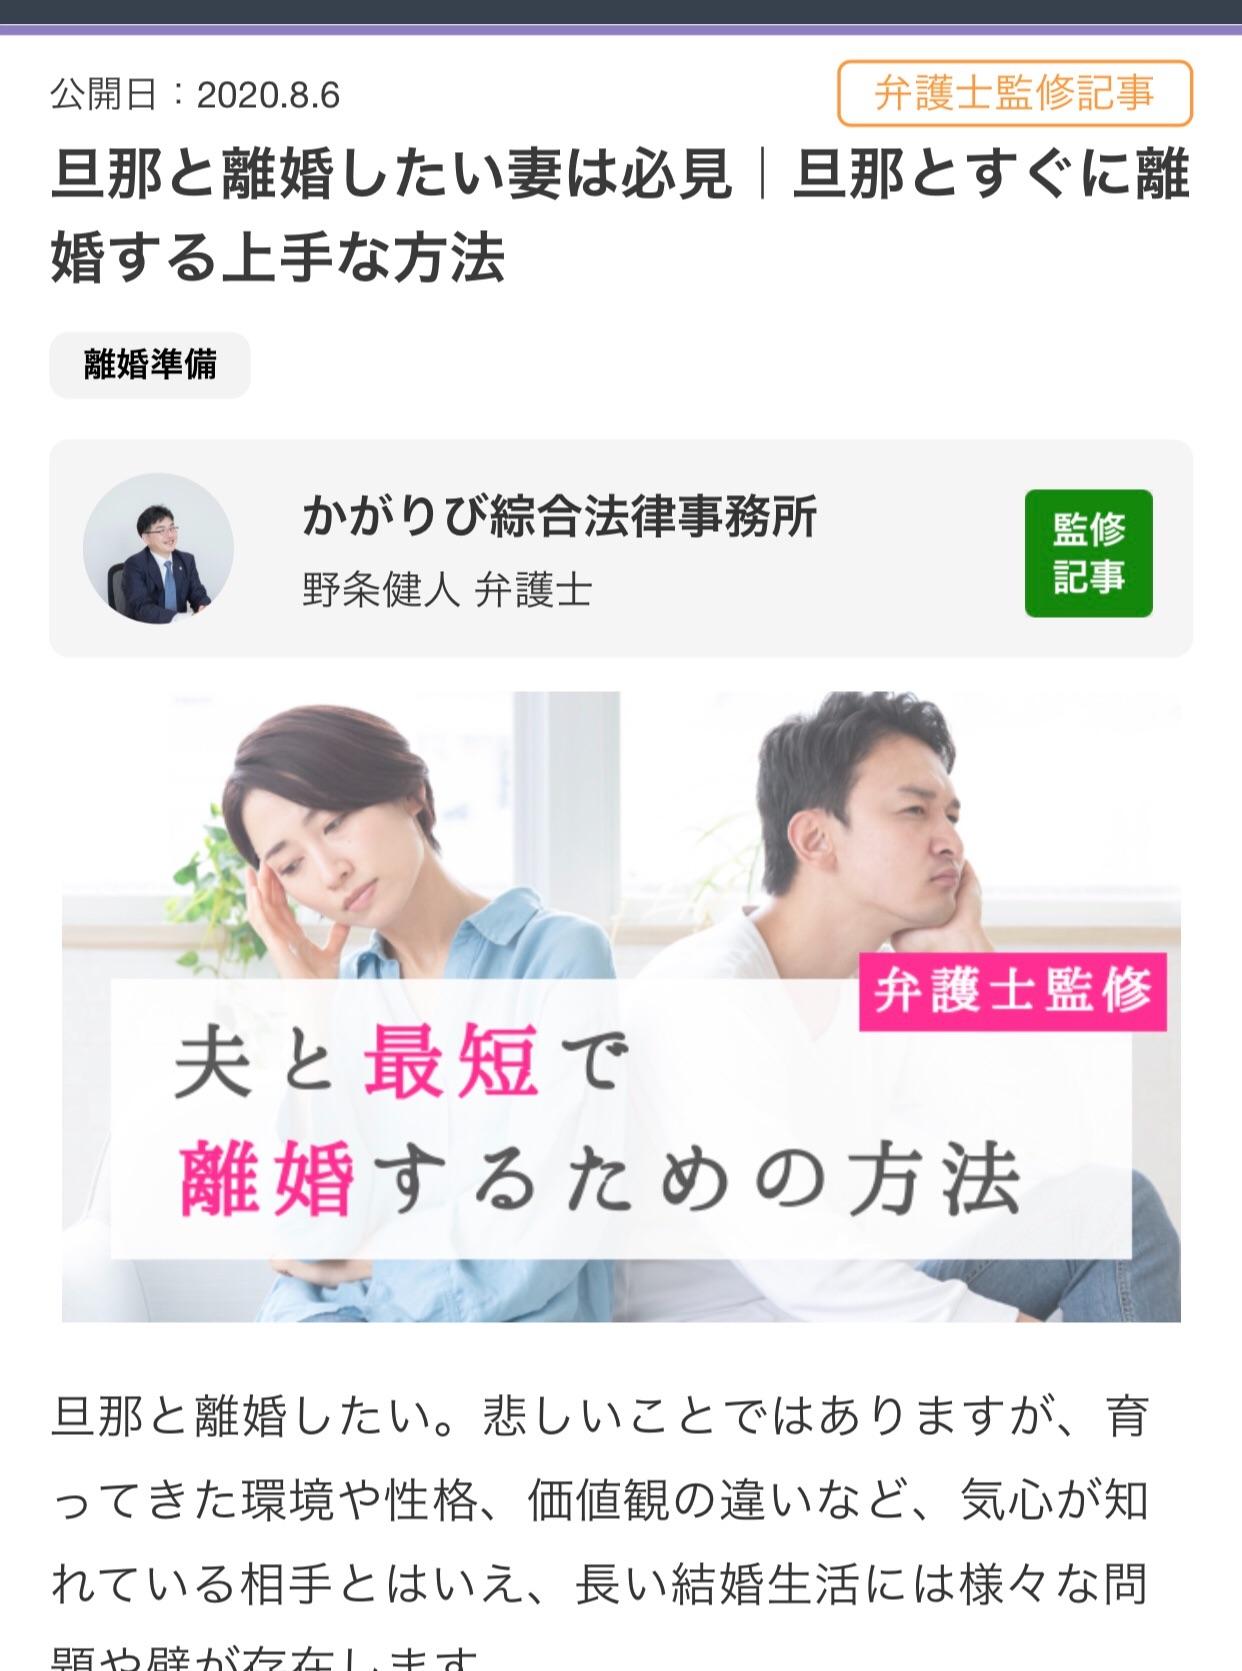 f:id:kagaribi-kotsujiko:20201230150941j:image